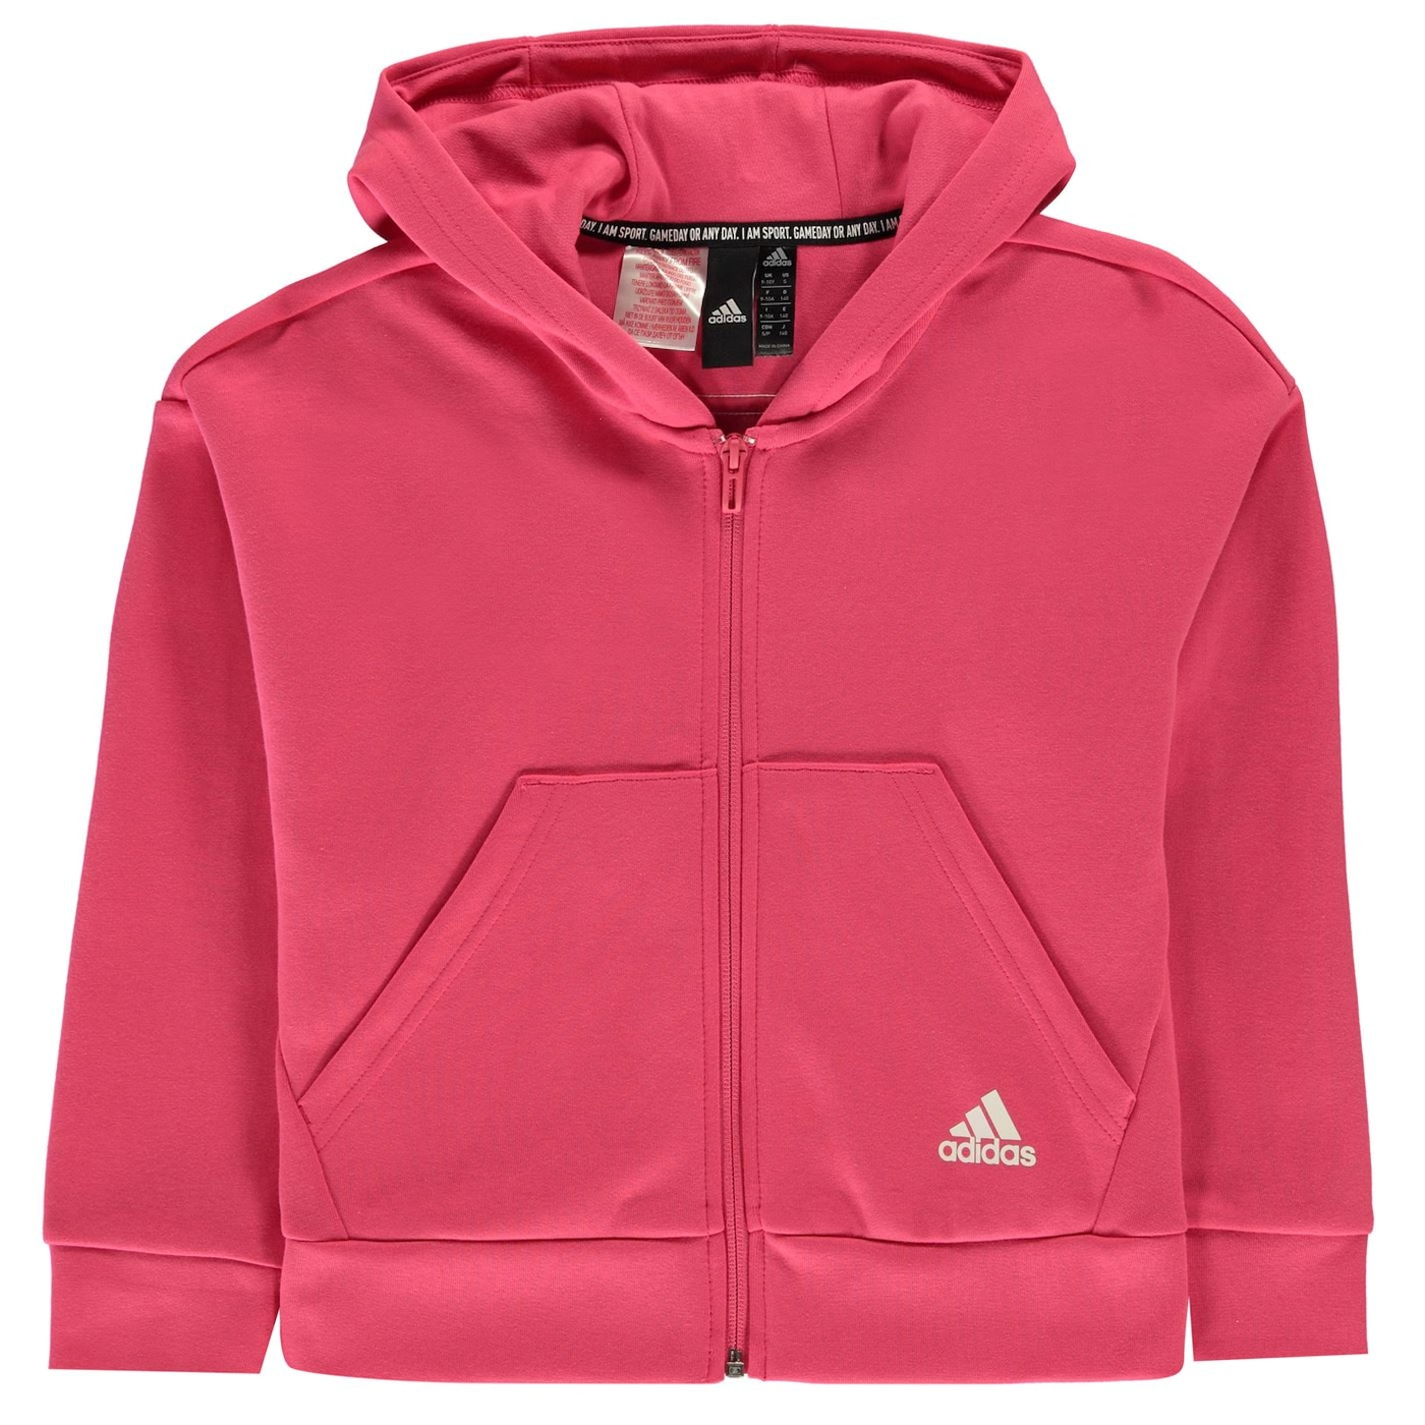 Adidas Full Zip Hoodie Junior Girls